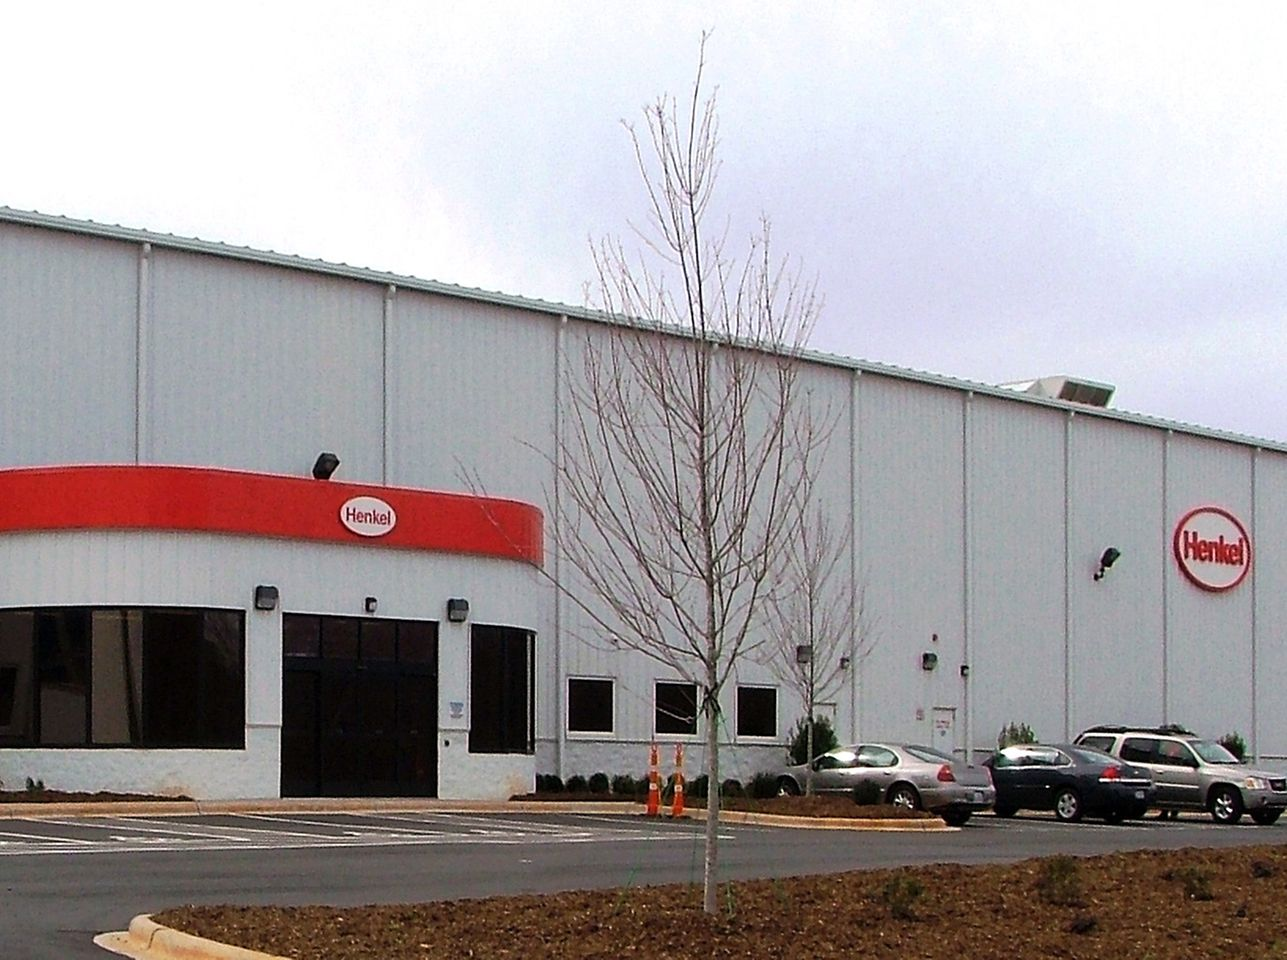 Location Henkel Corporation, Salisbury, NC, United States